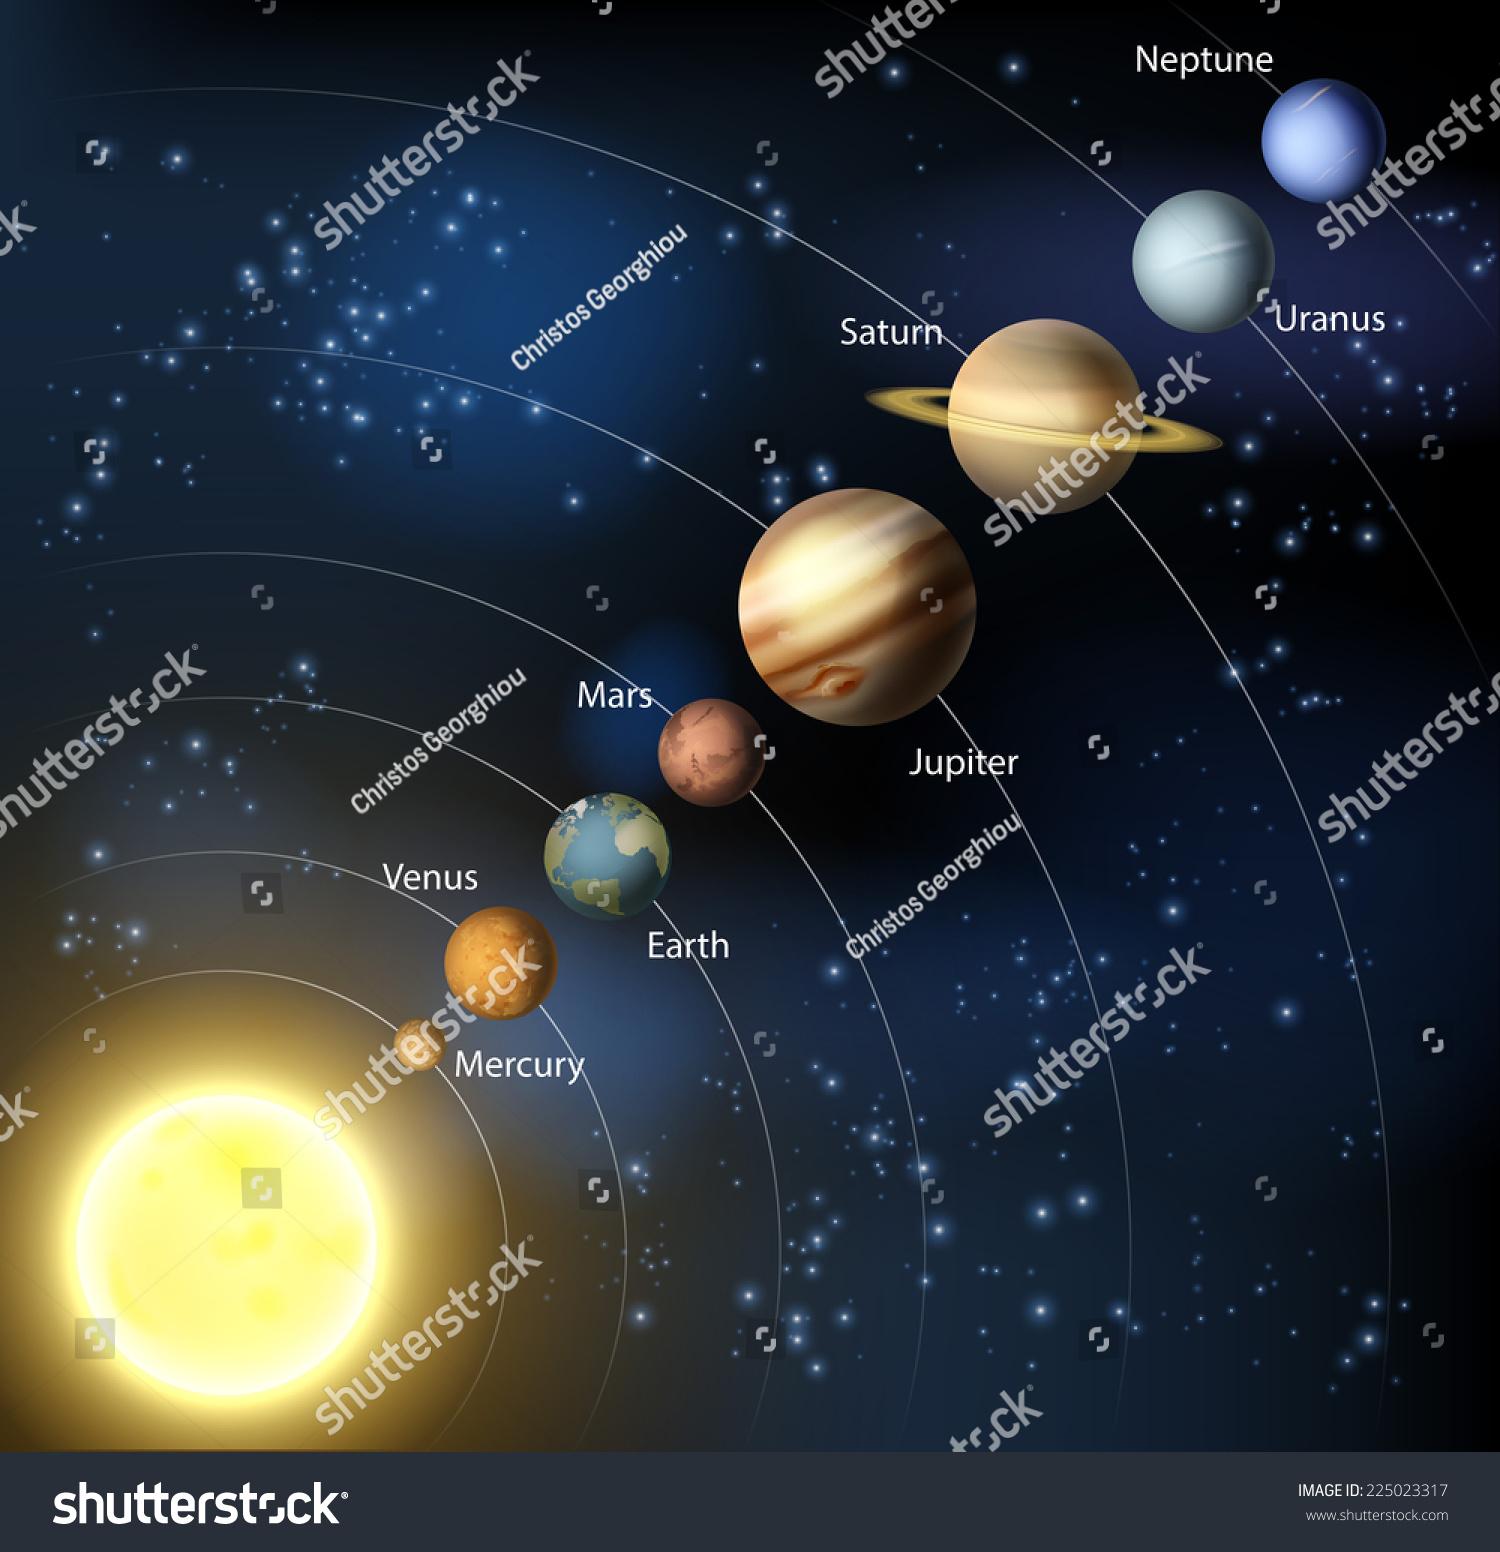 planets around the sun - photo #14